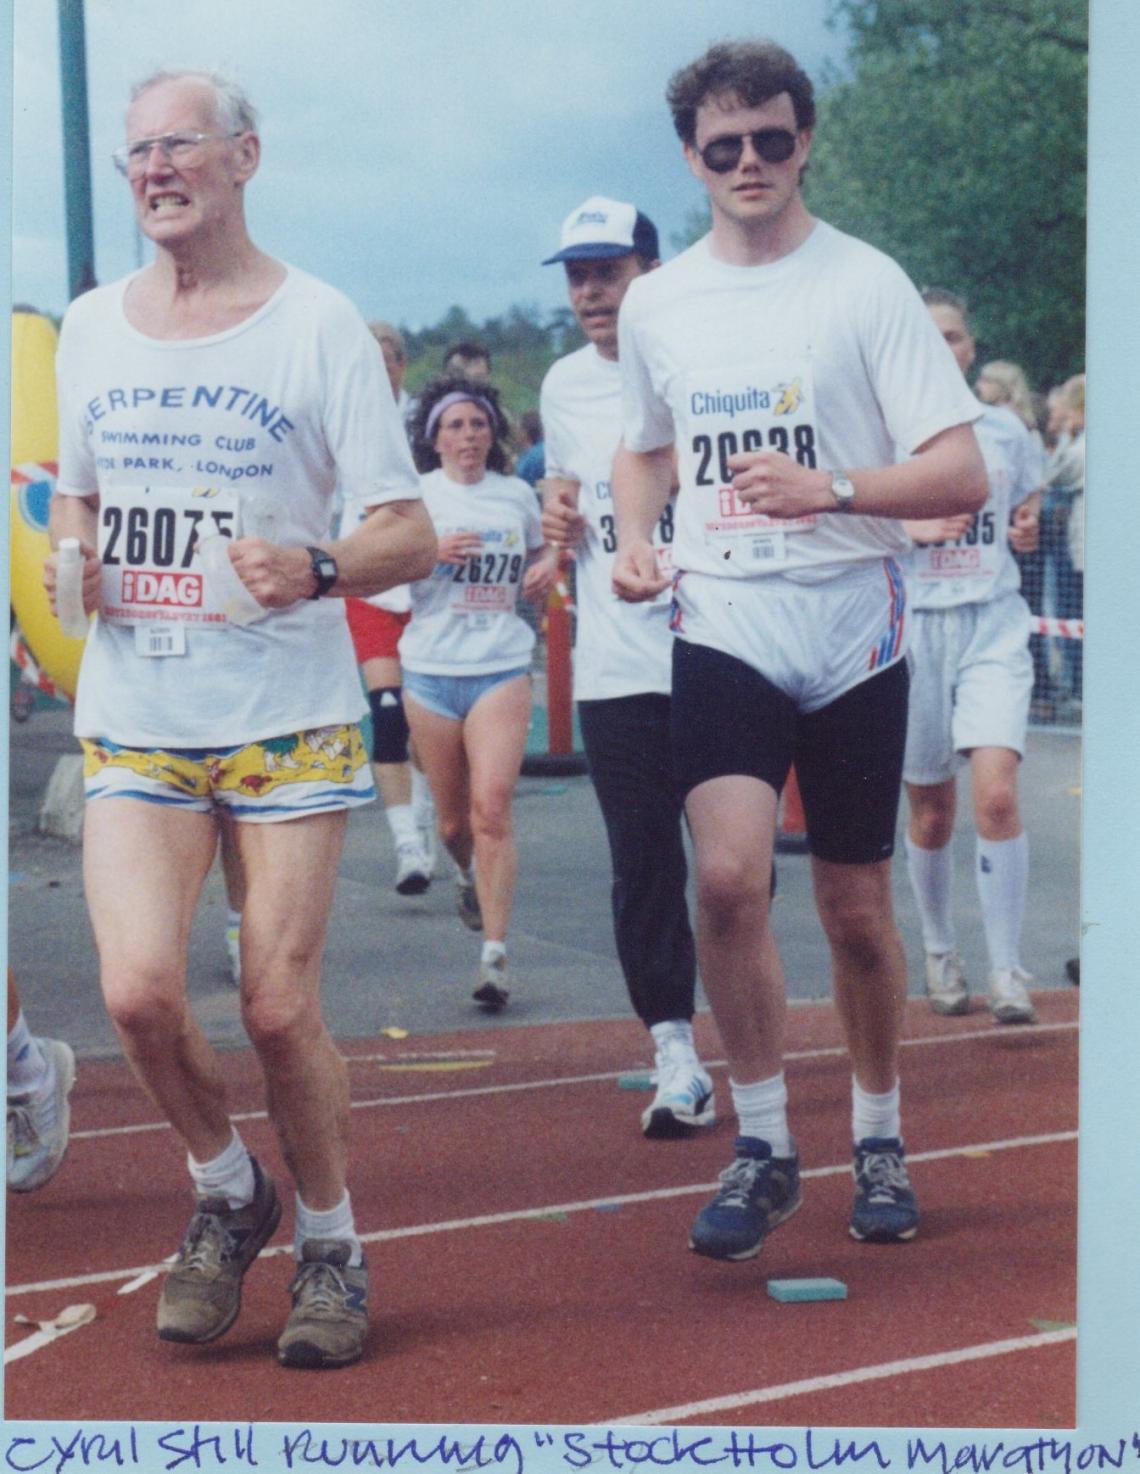 Stockholm Marathon 1991